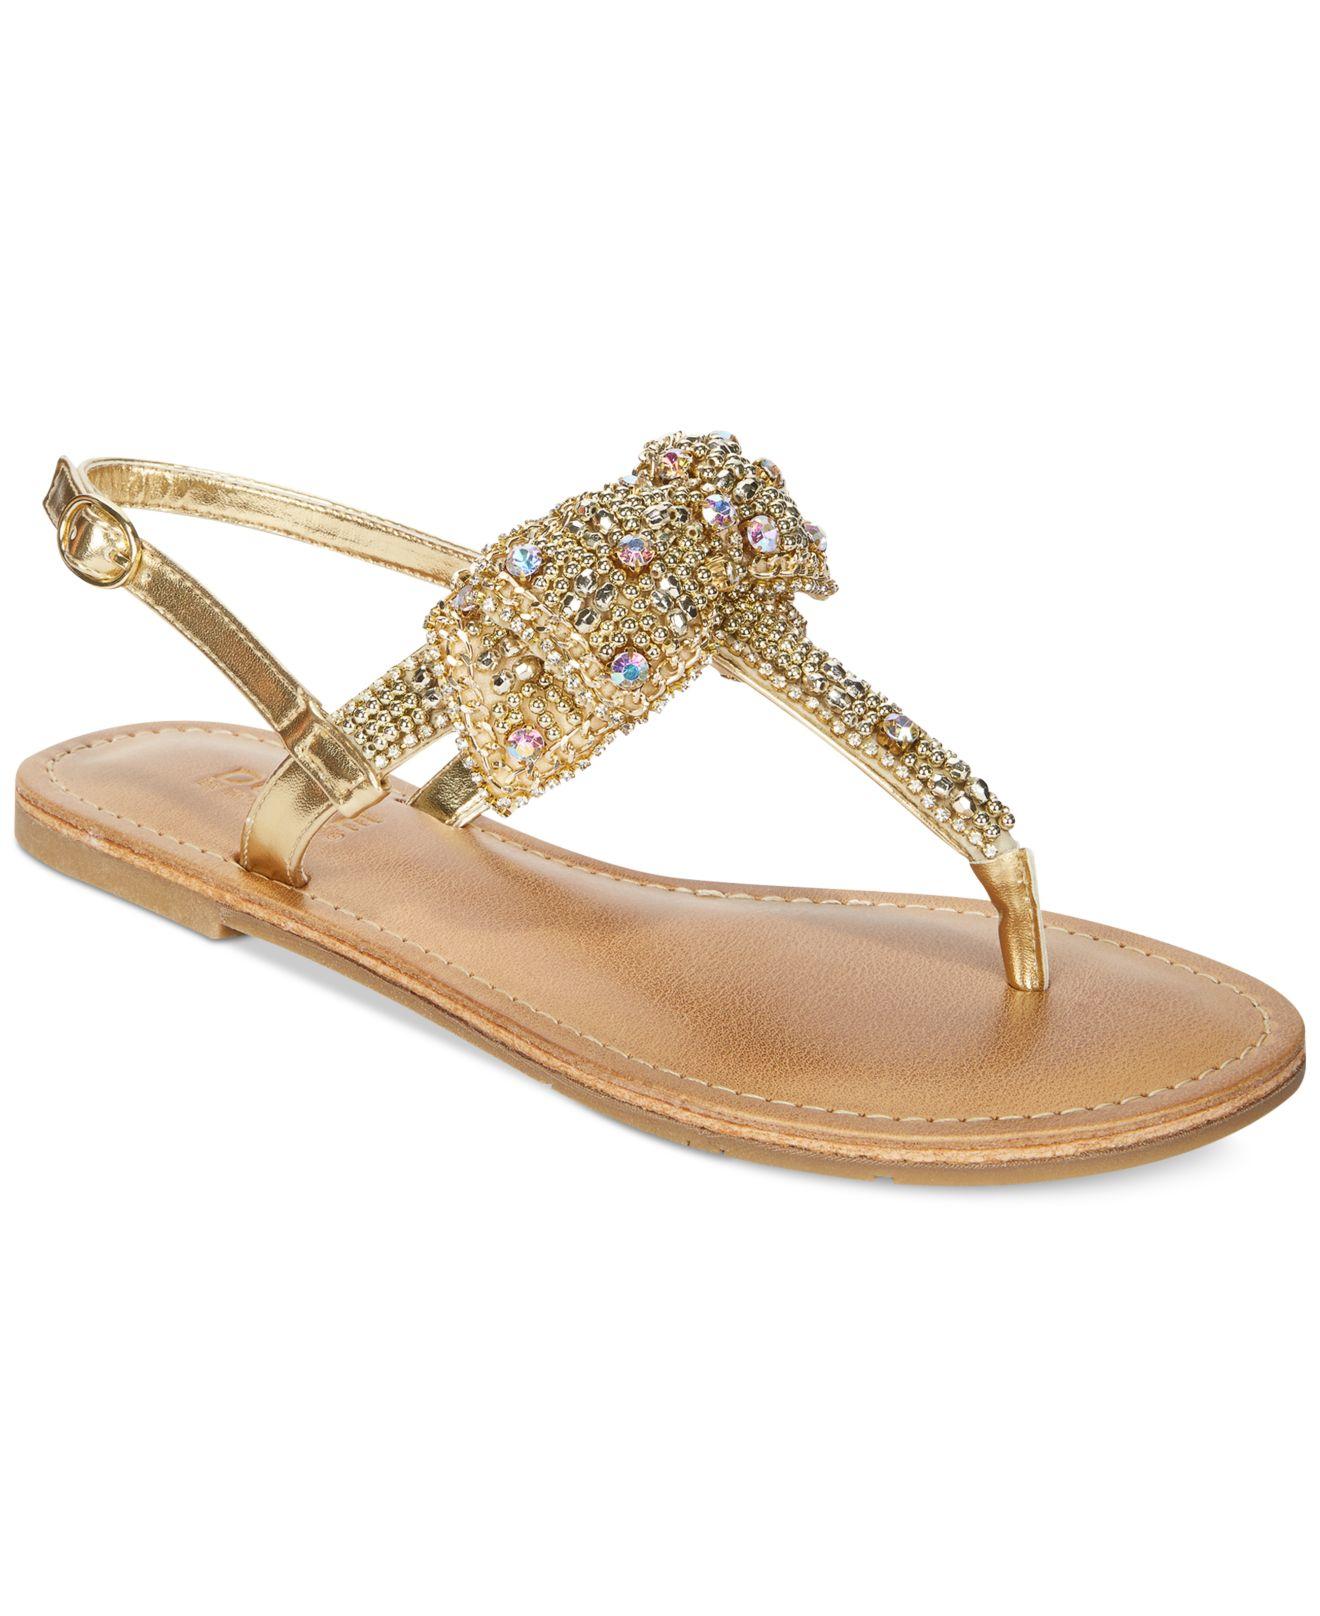 51446596a404 Lyst - Mojo Moxy Dolce By Sienna Rhinestone Bow Flat Thong Sandals ...